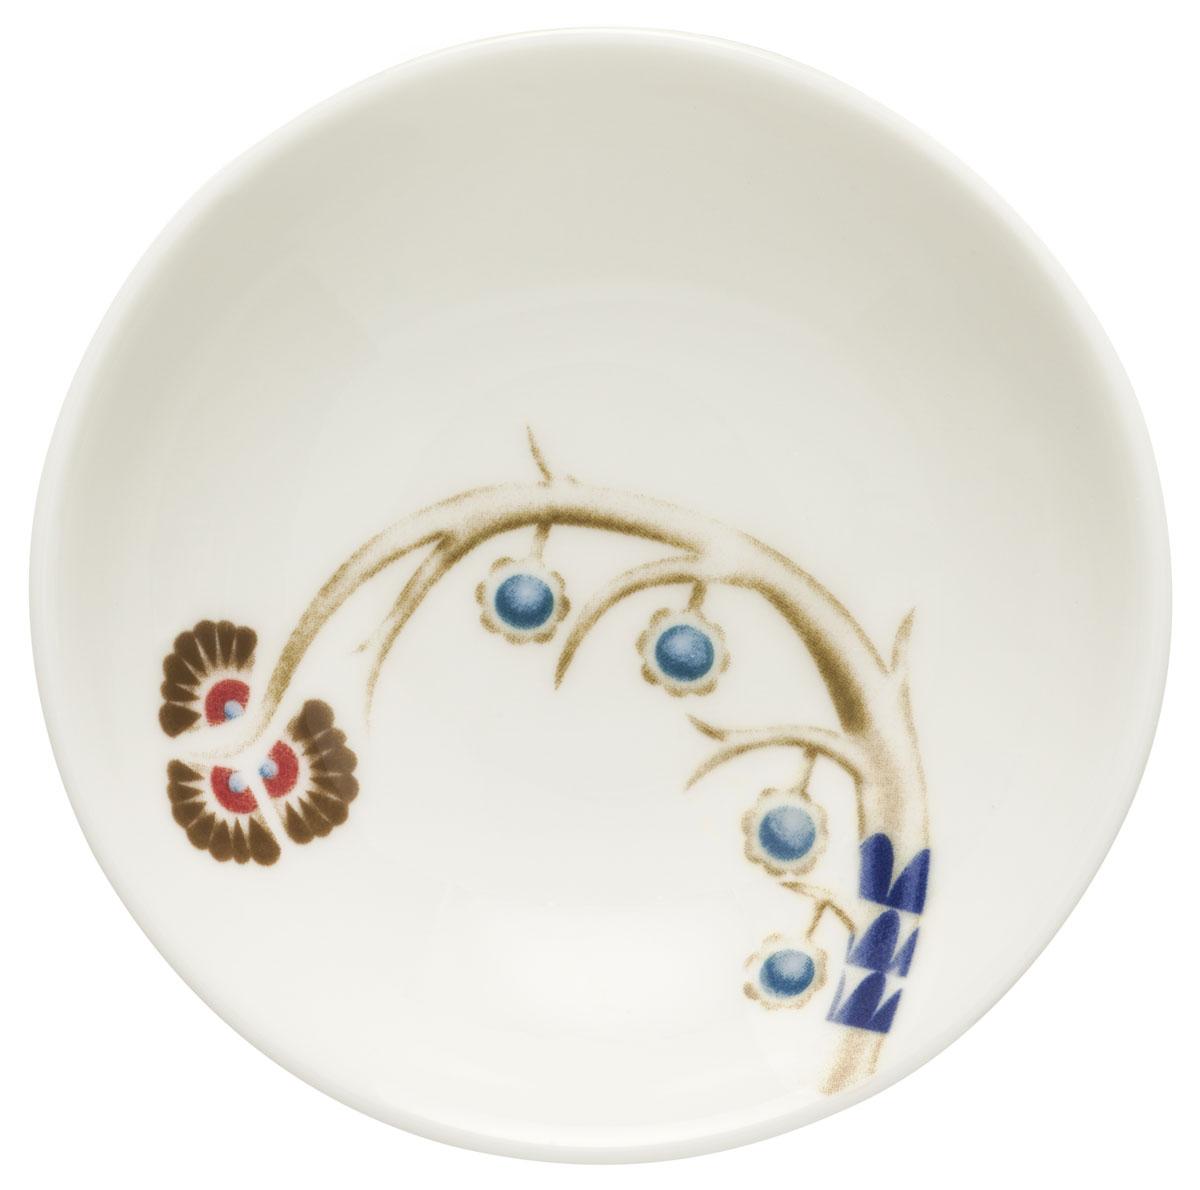 Блюдце Iittala Taika, цвет: белый, диаметр 9,5 см1011647